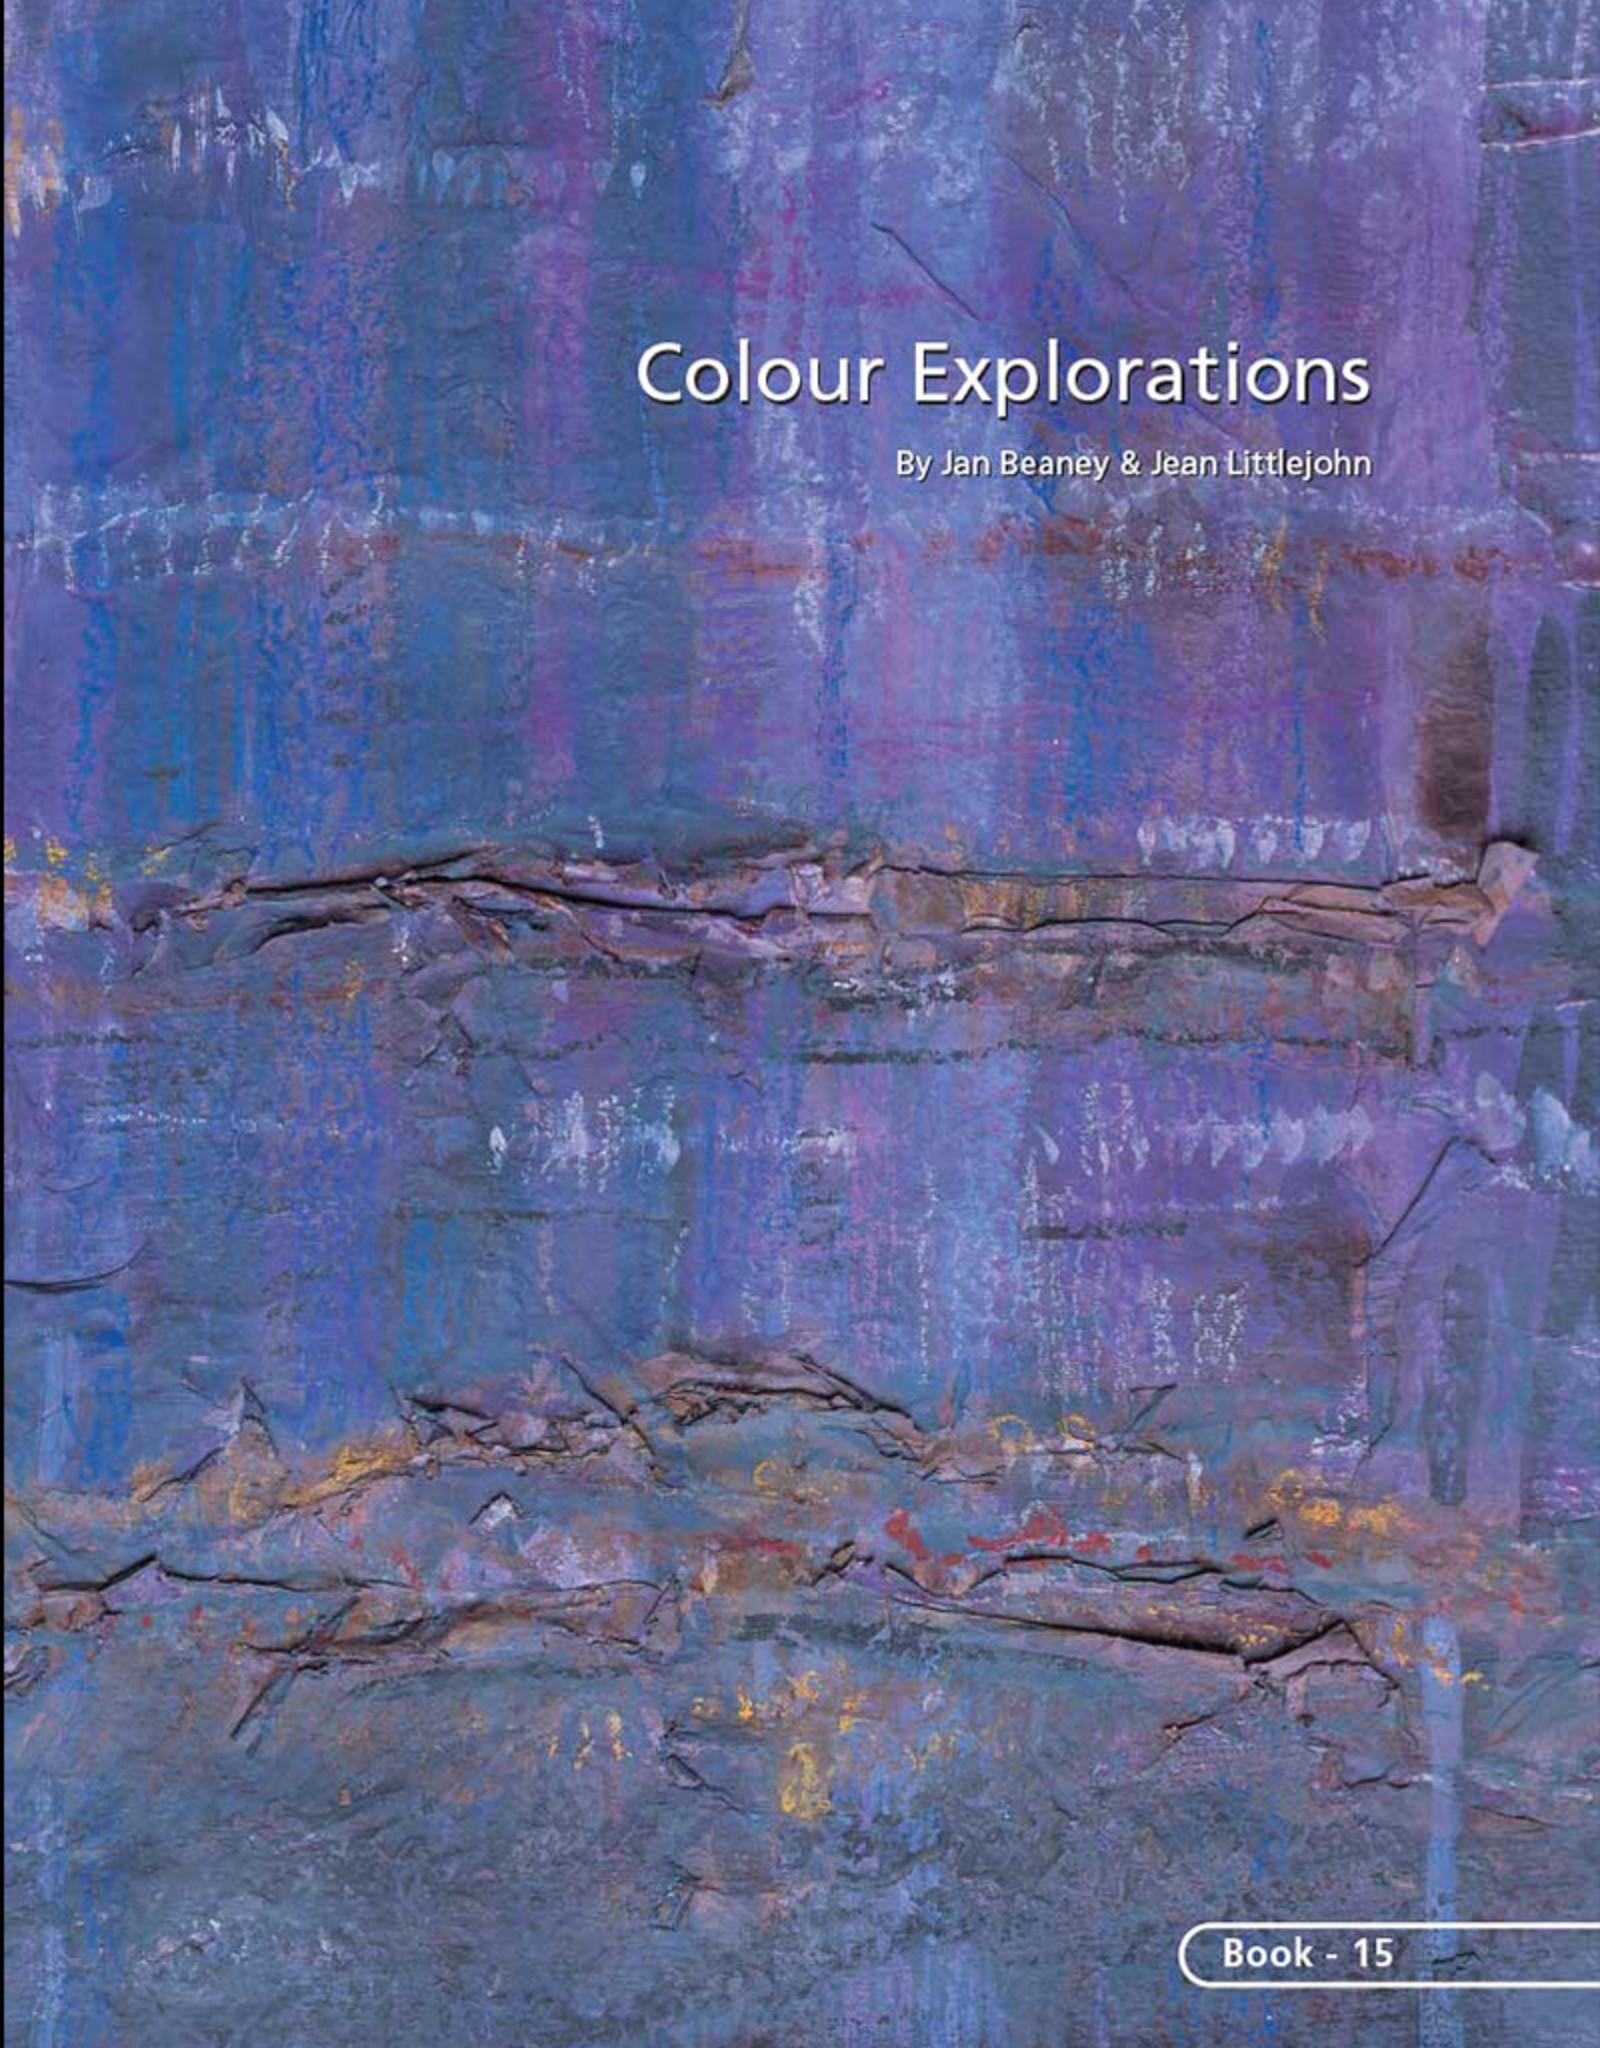 Colour Explorations / Jan Beaney & Jean Littlejohn